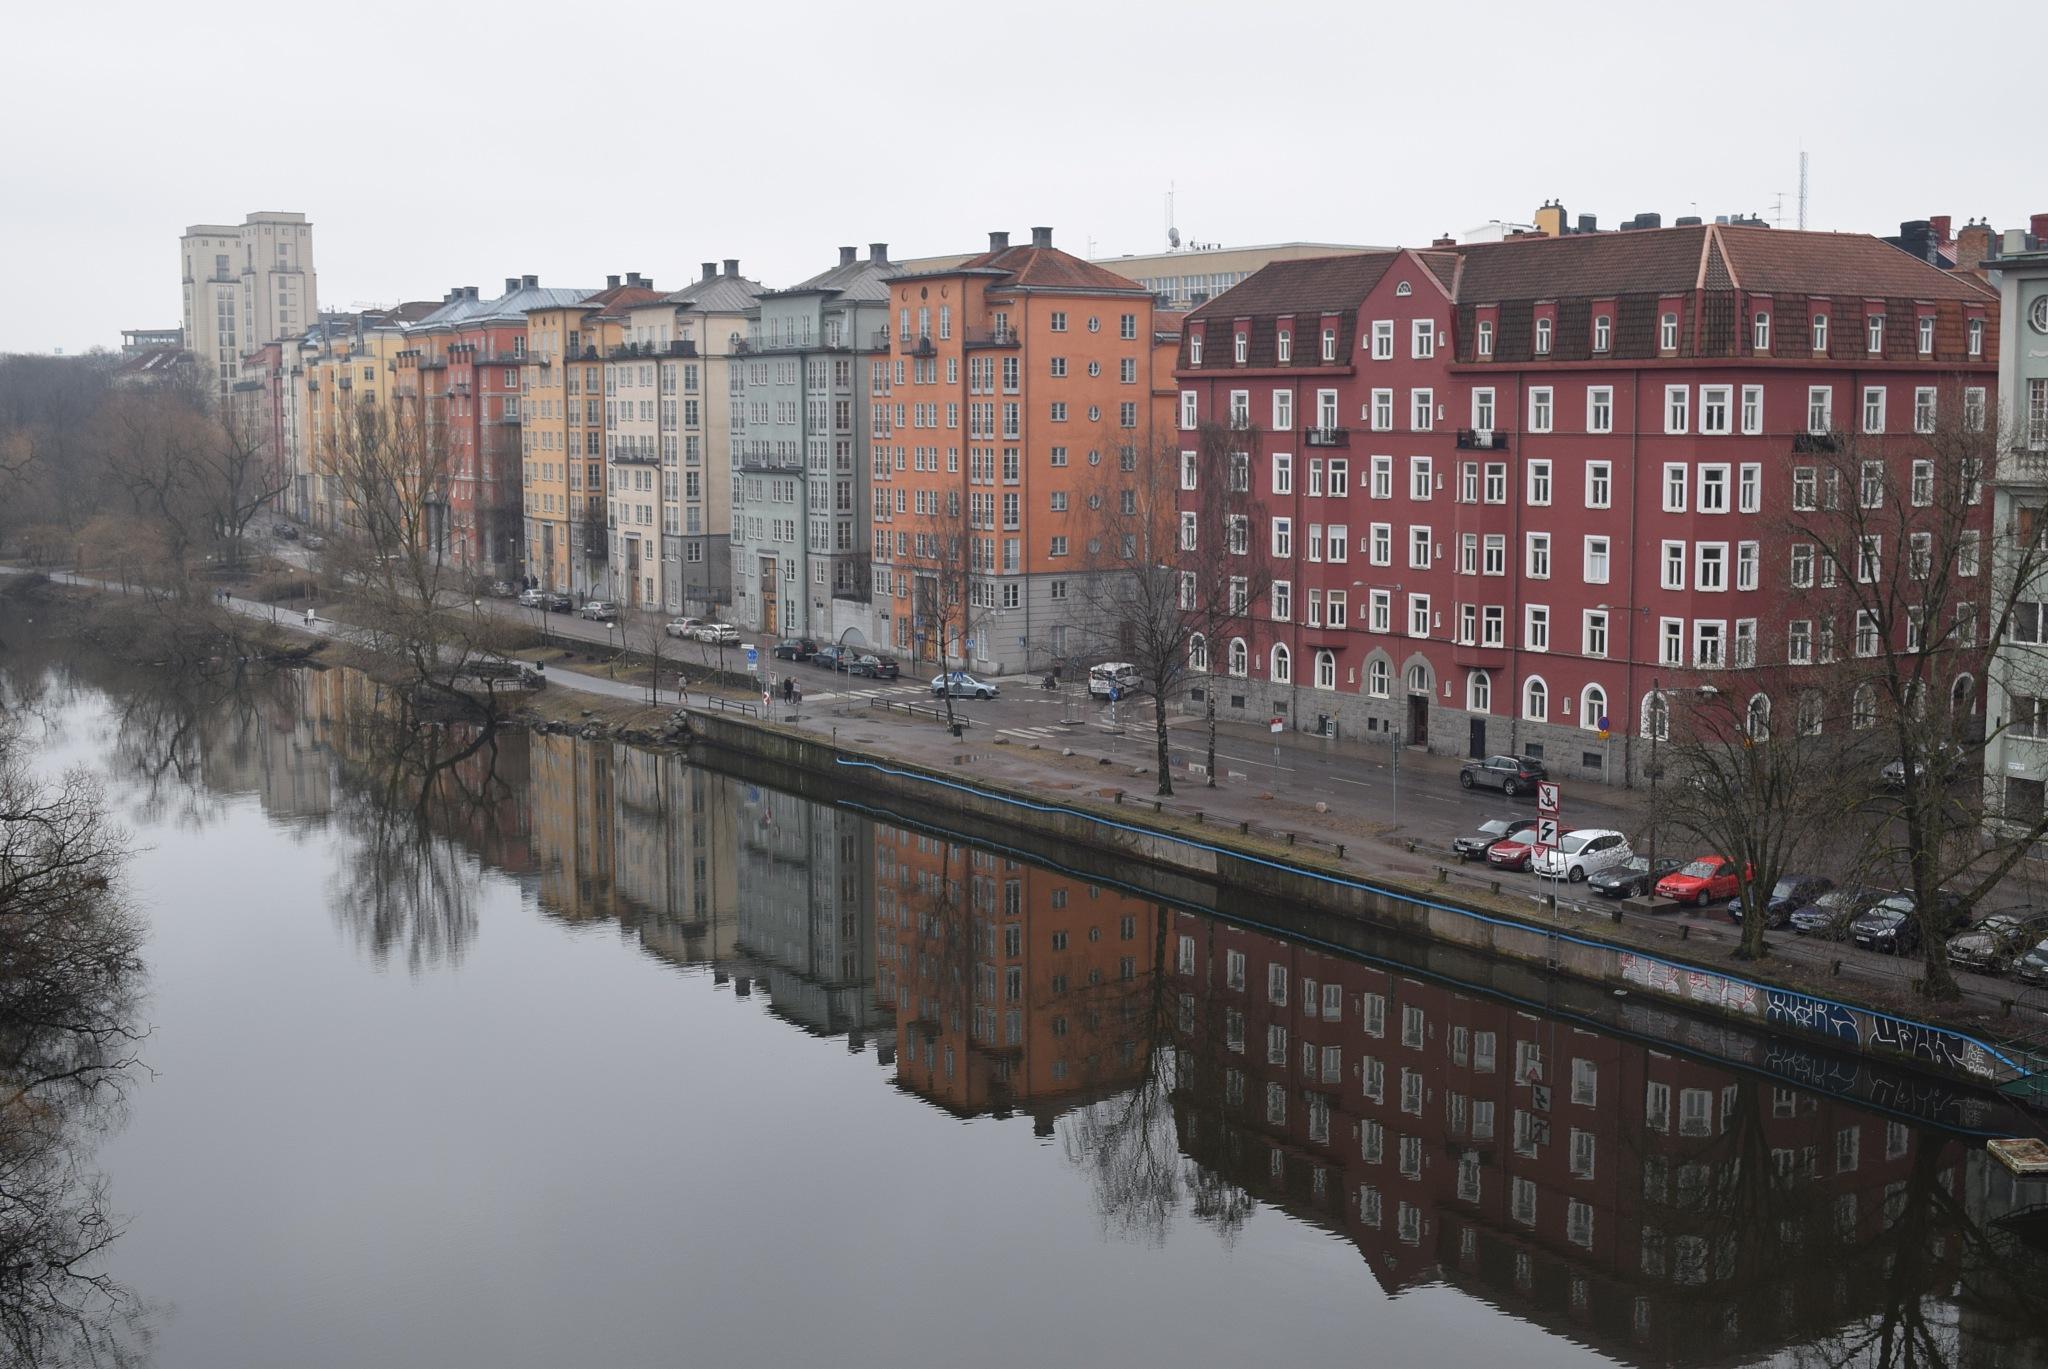 Reflecting upon the reflections by Valeria Milova